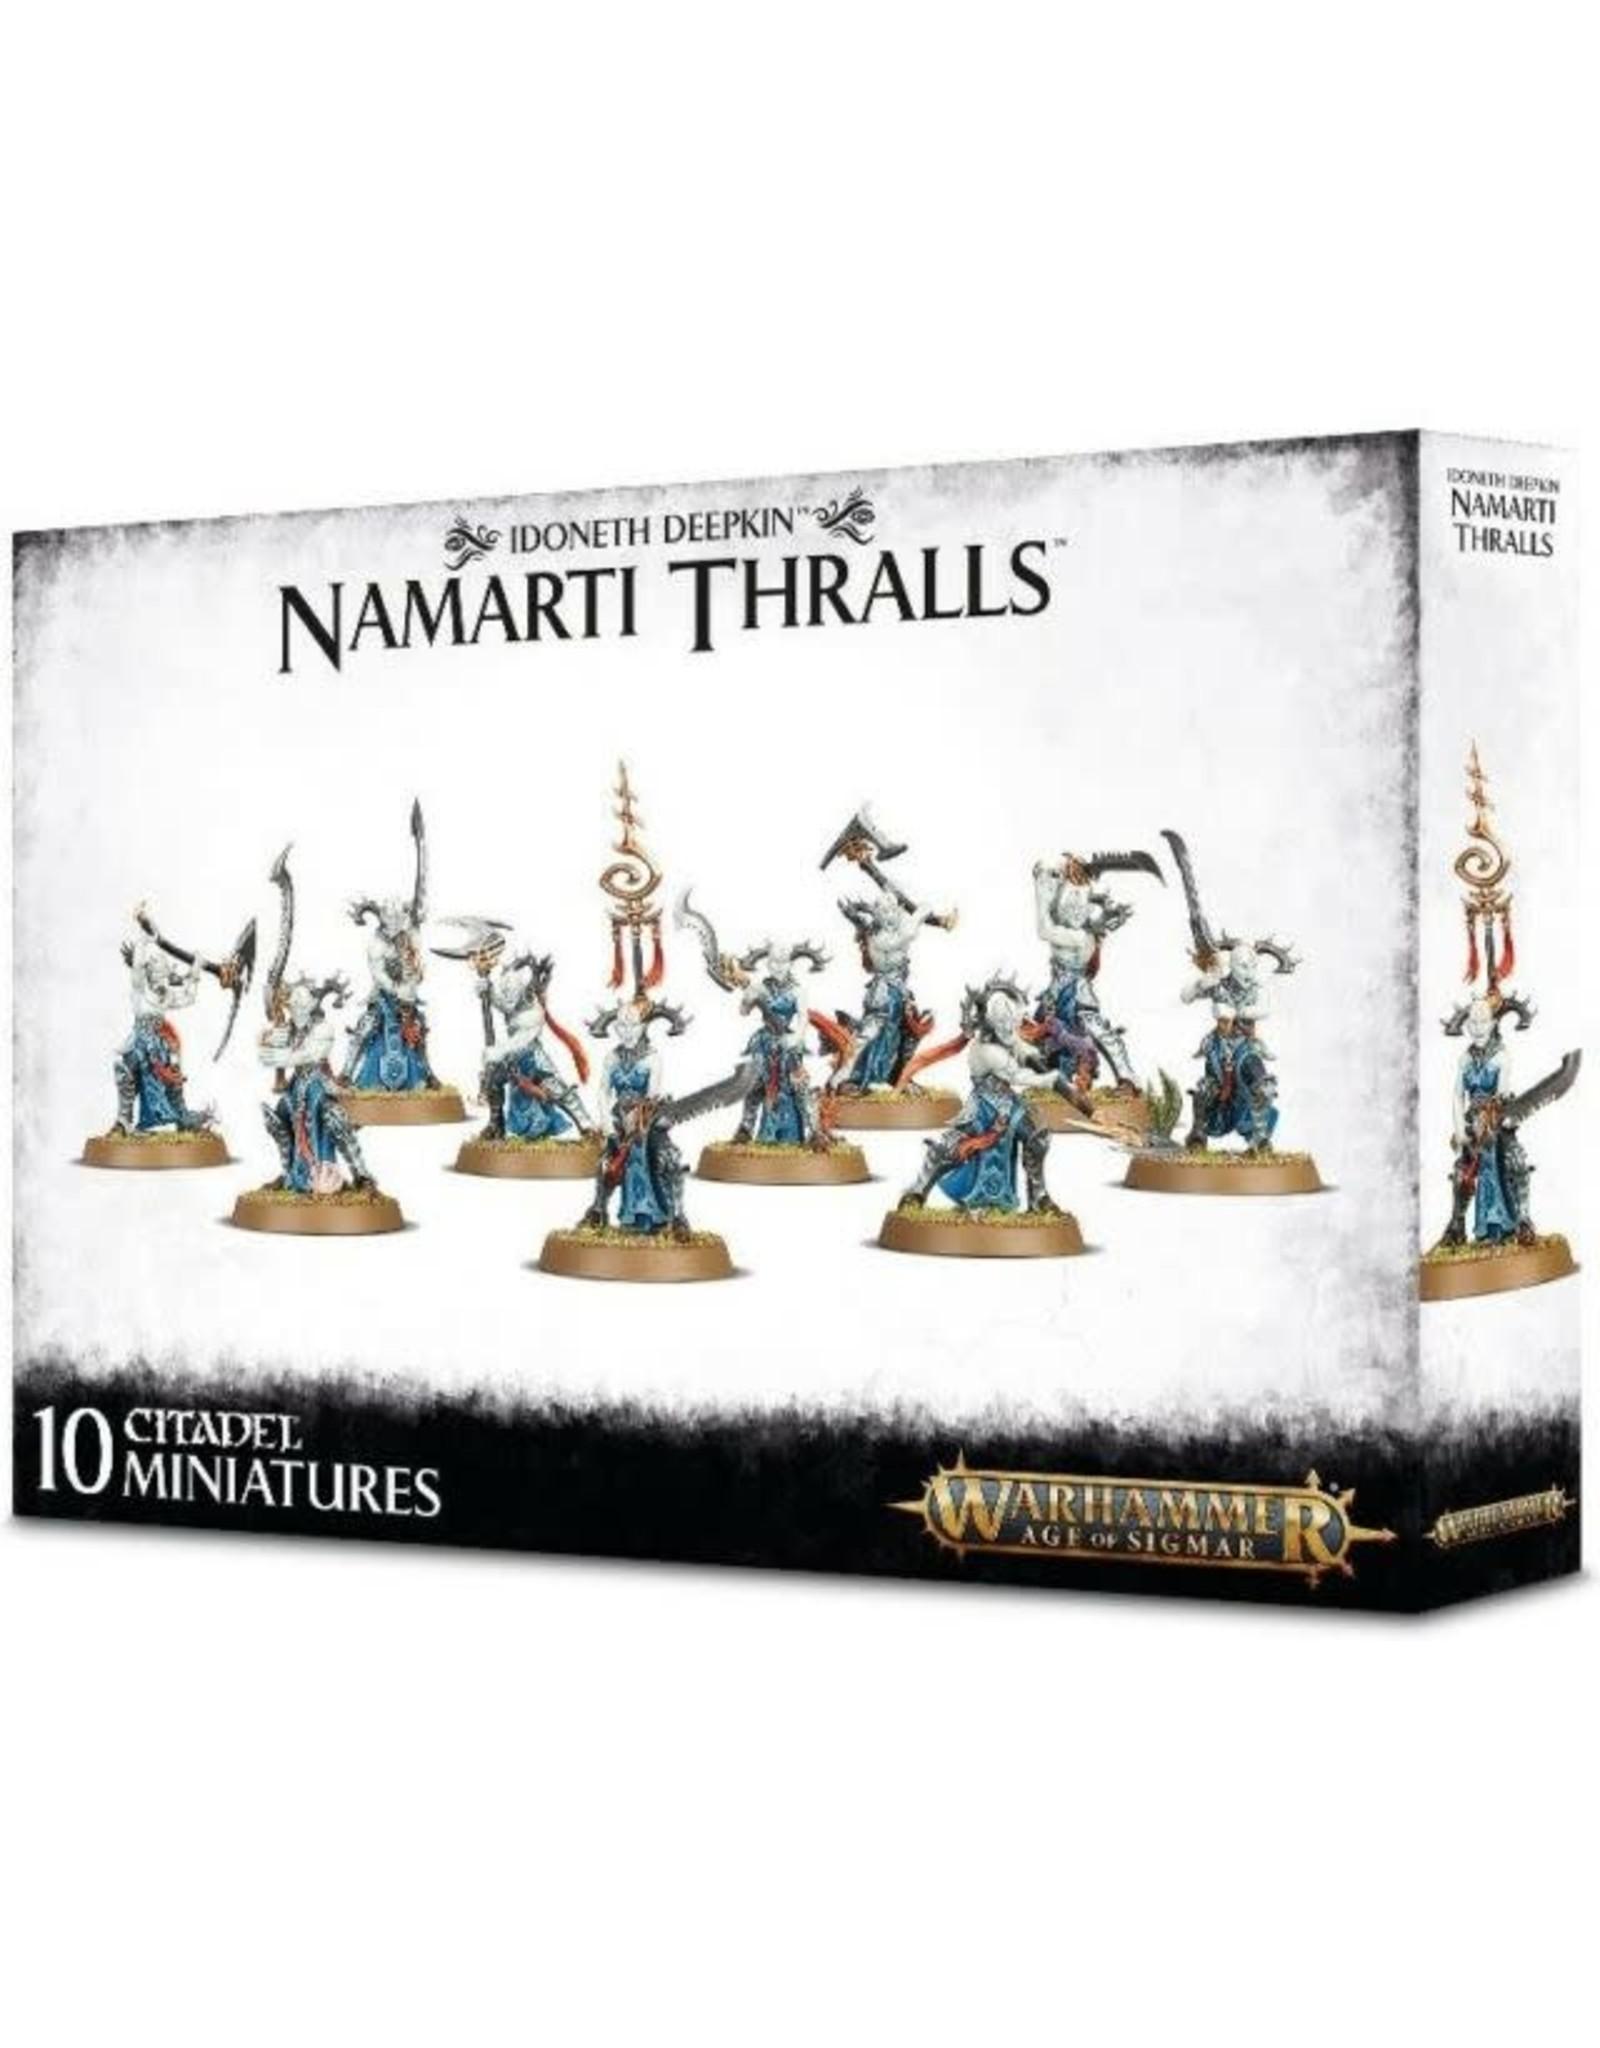 Idoneth Deepkin Namarti Thralls (AOS)